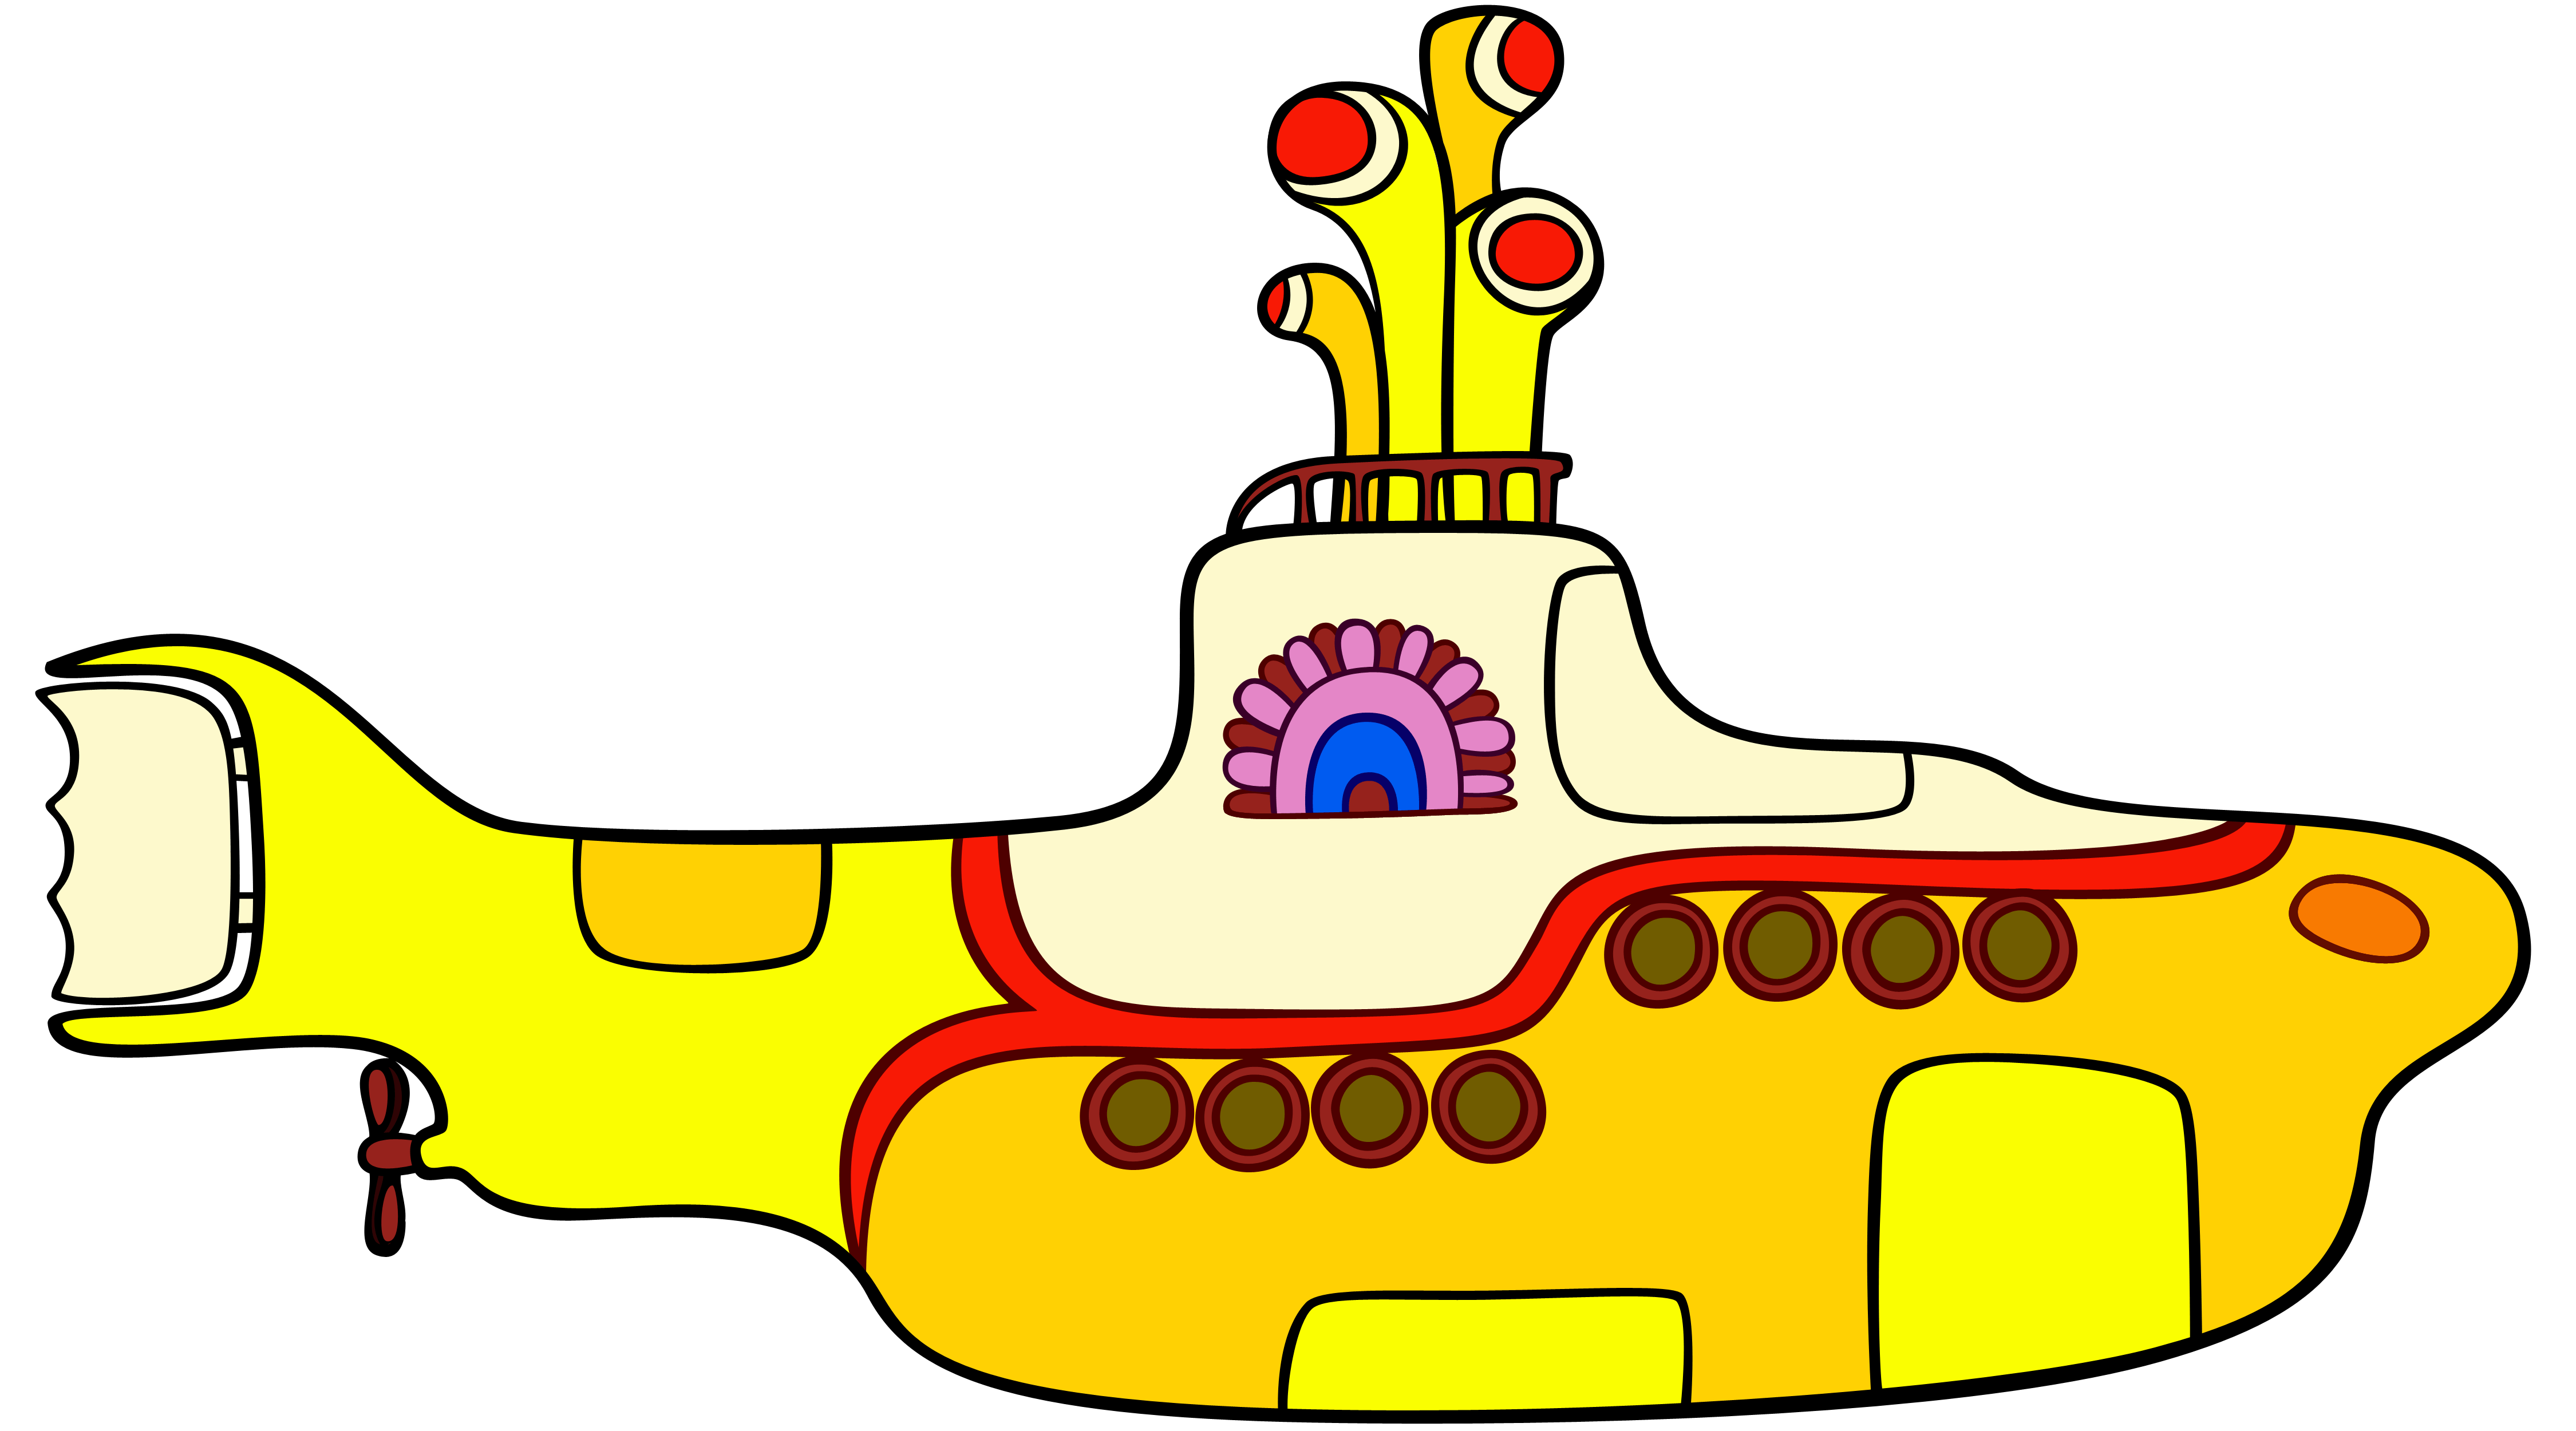 Beatles Yellow Submarine Logo Logodix